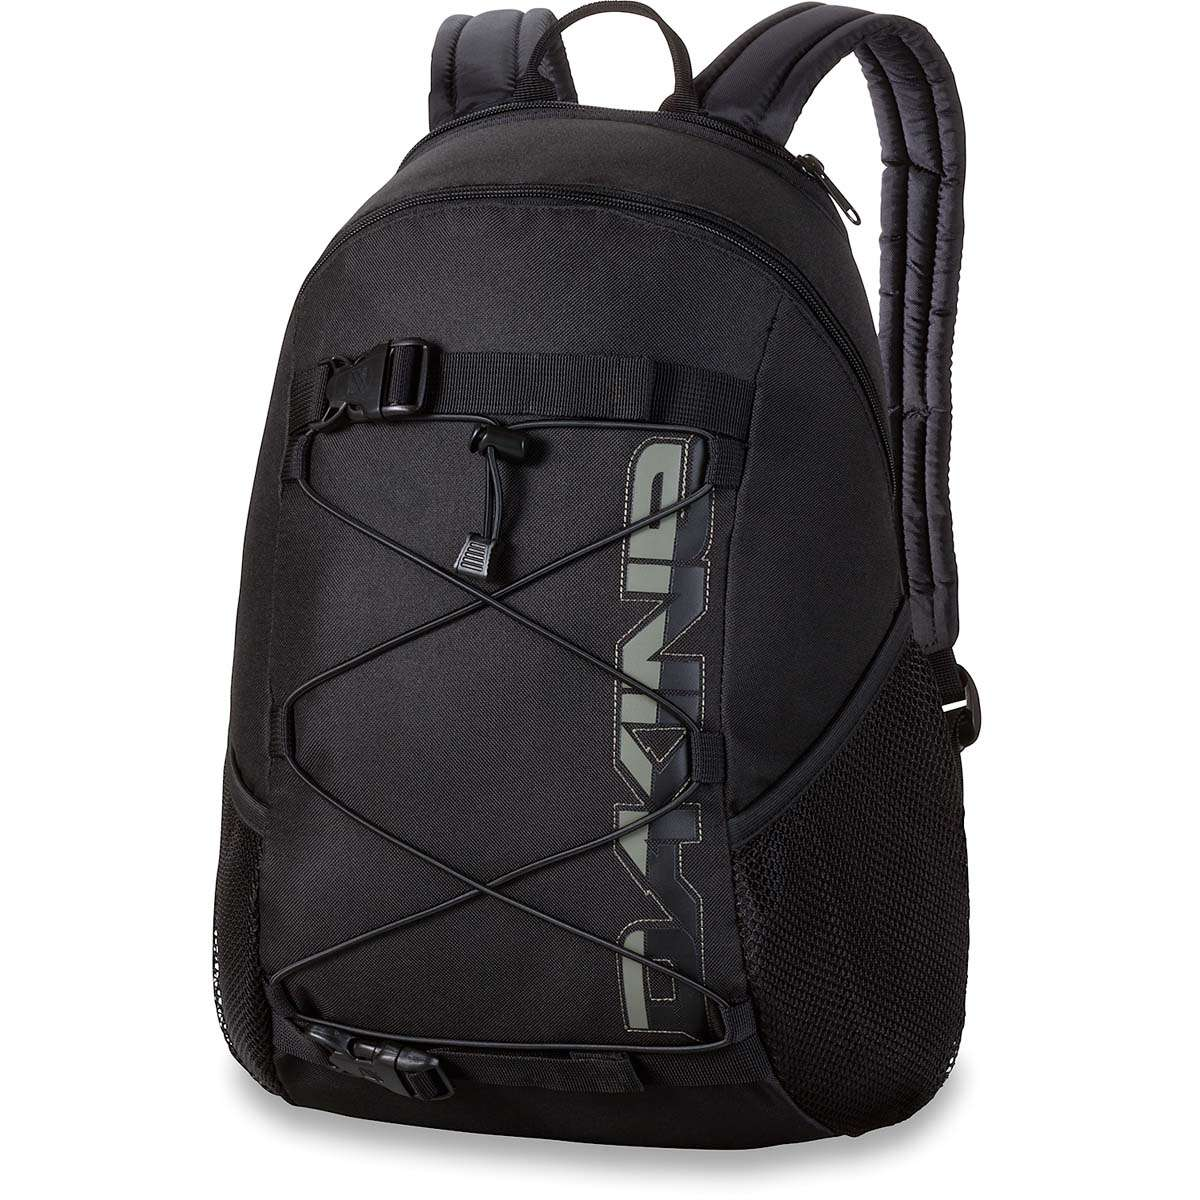 78195df100f52 Dakine Wonder 15L Backpack Black